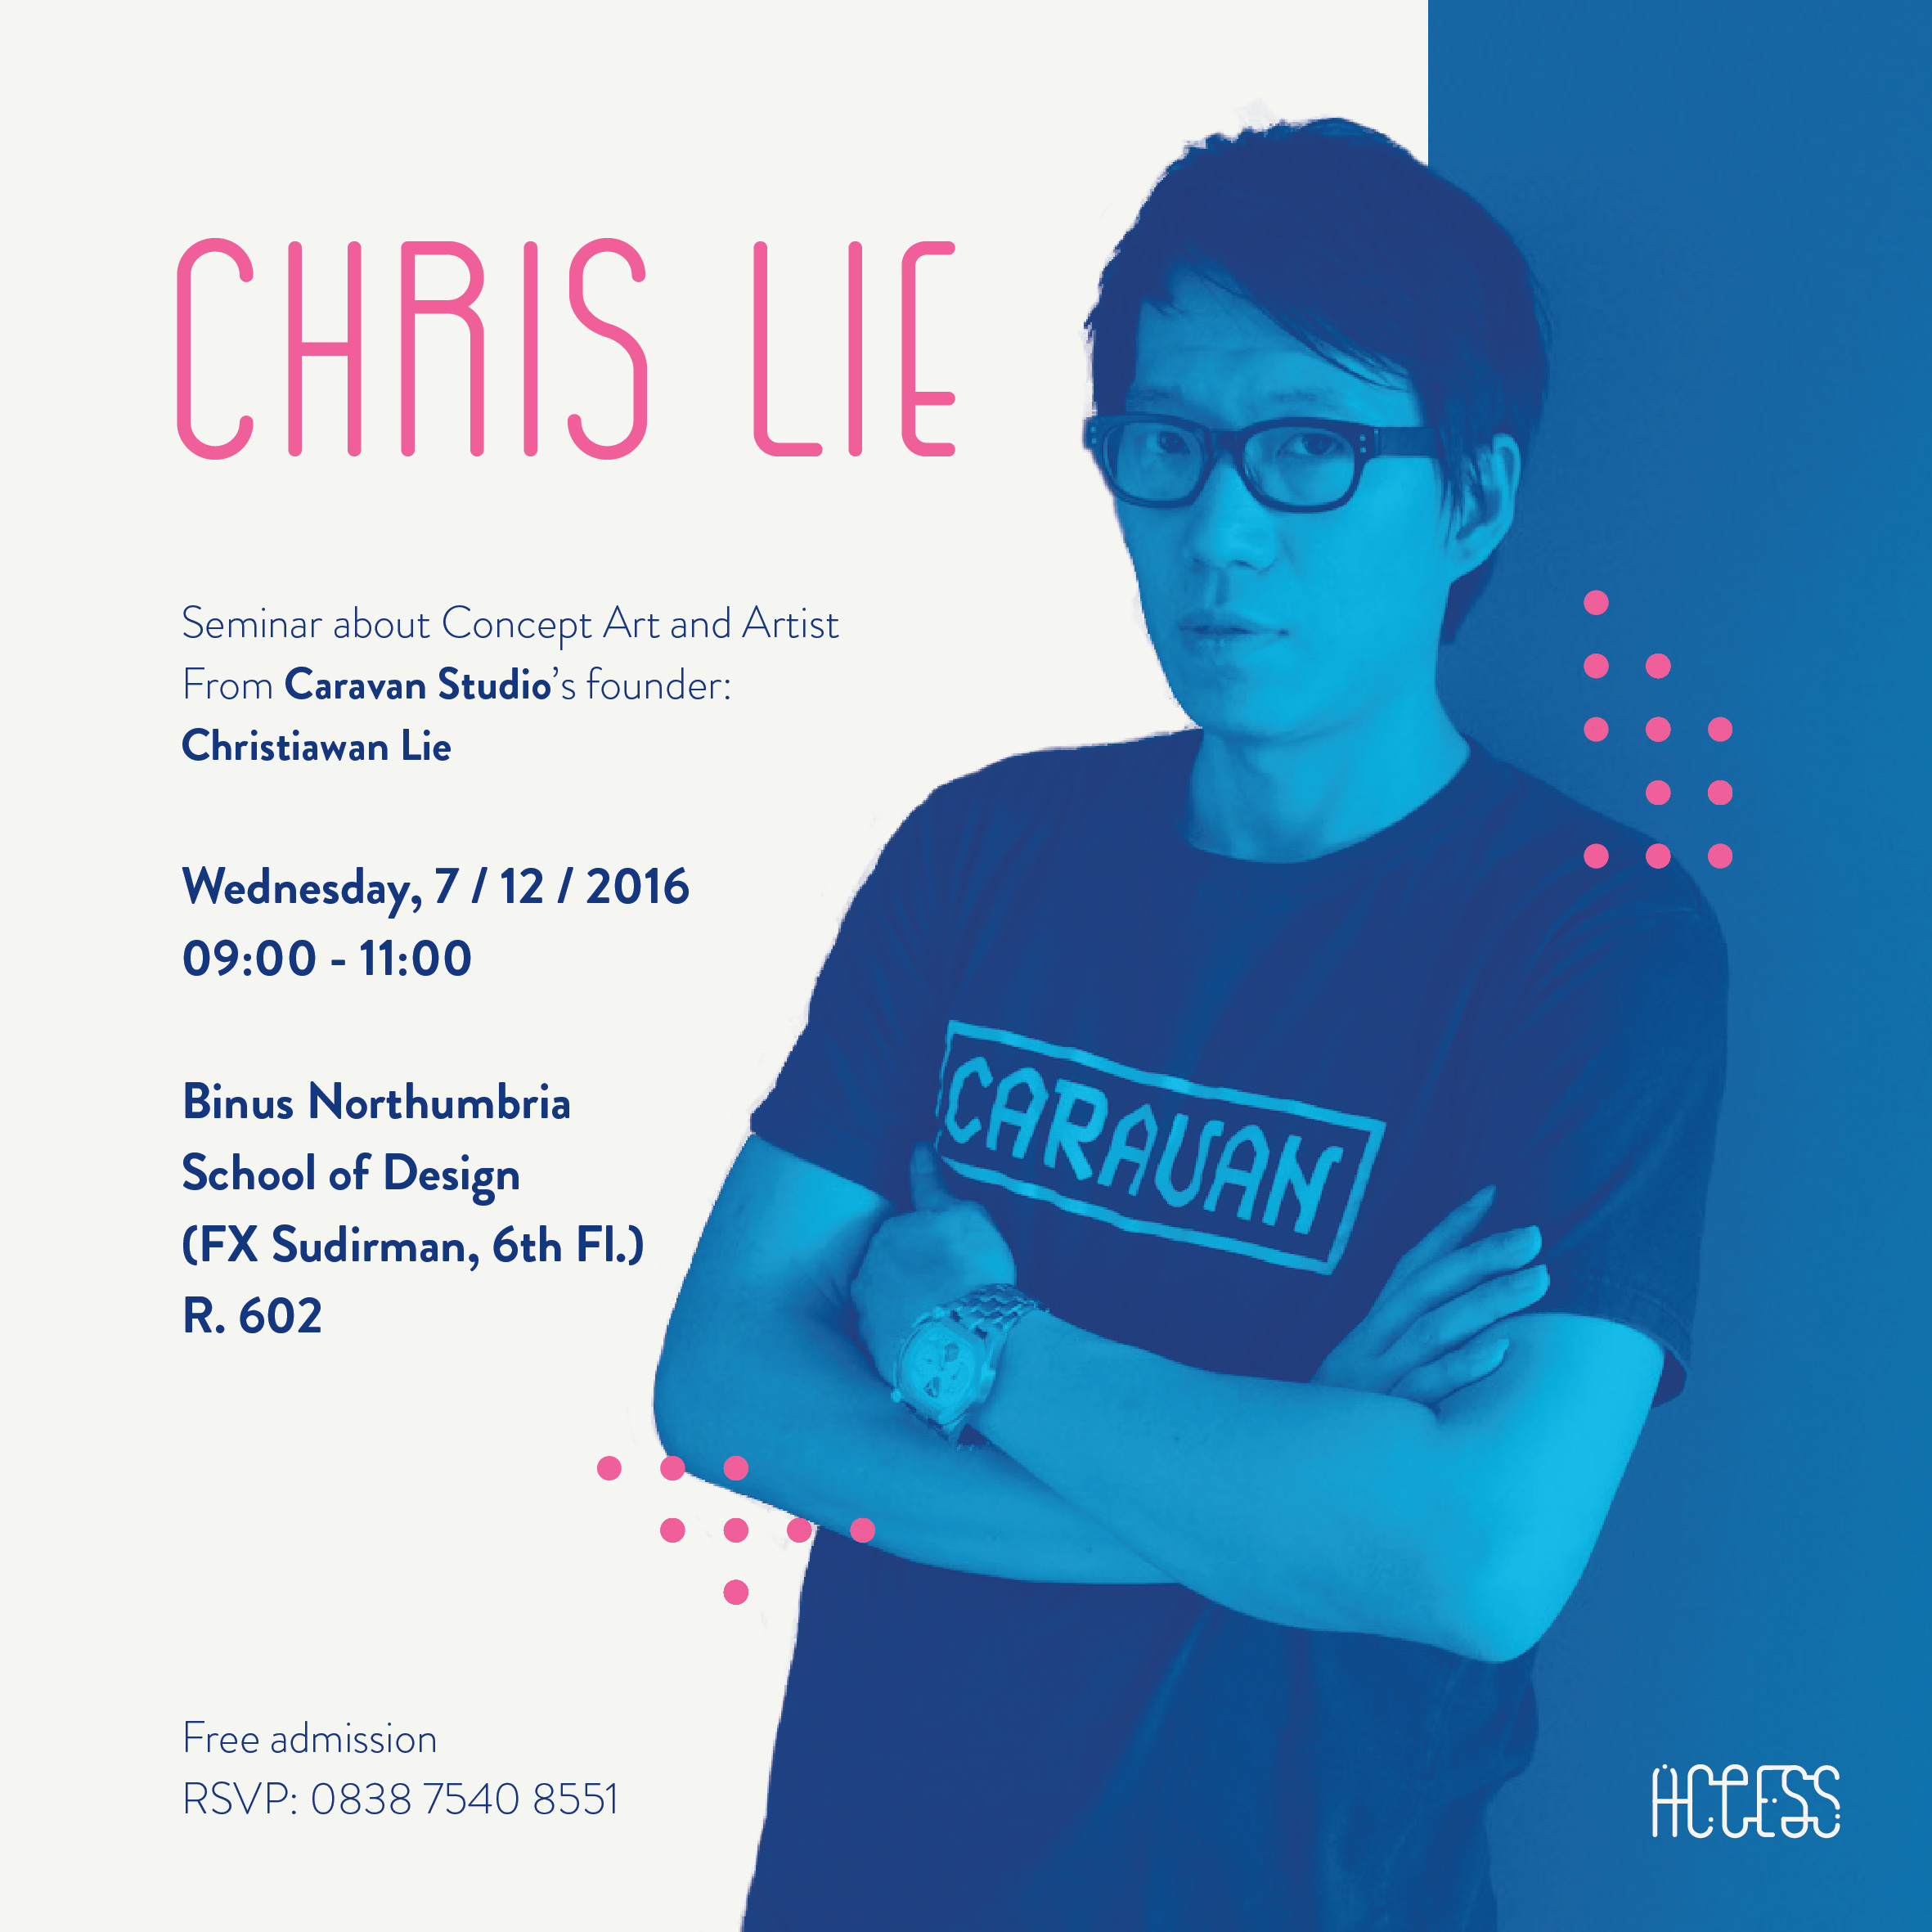 Chris Lie